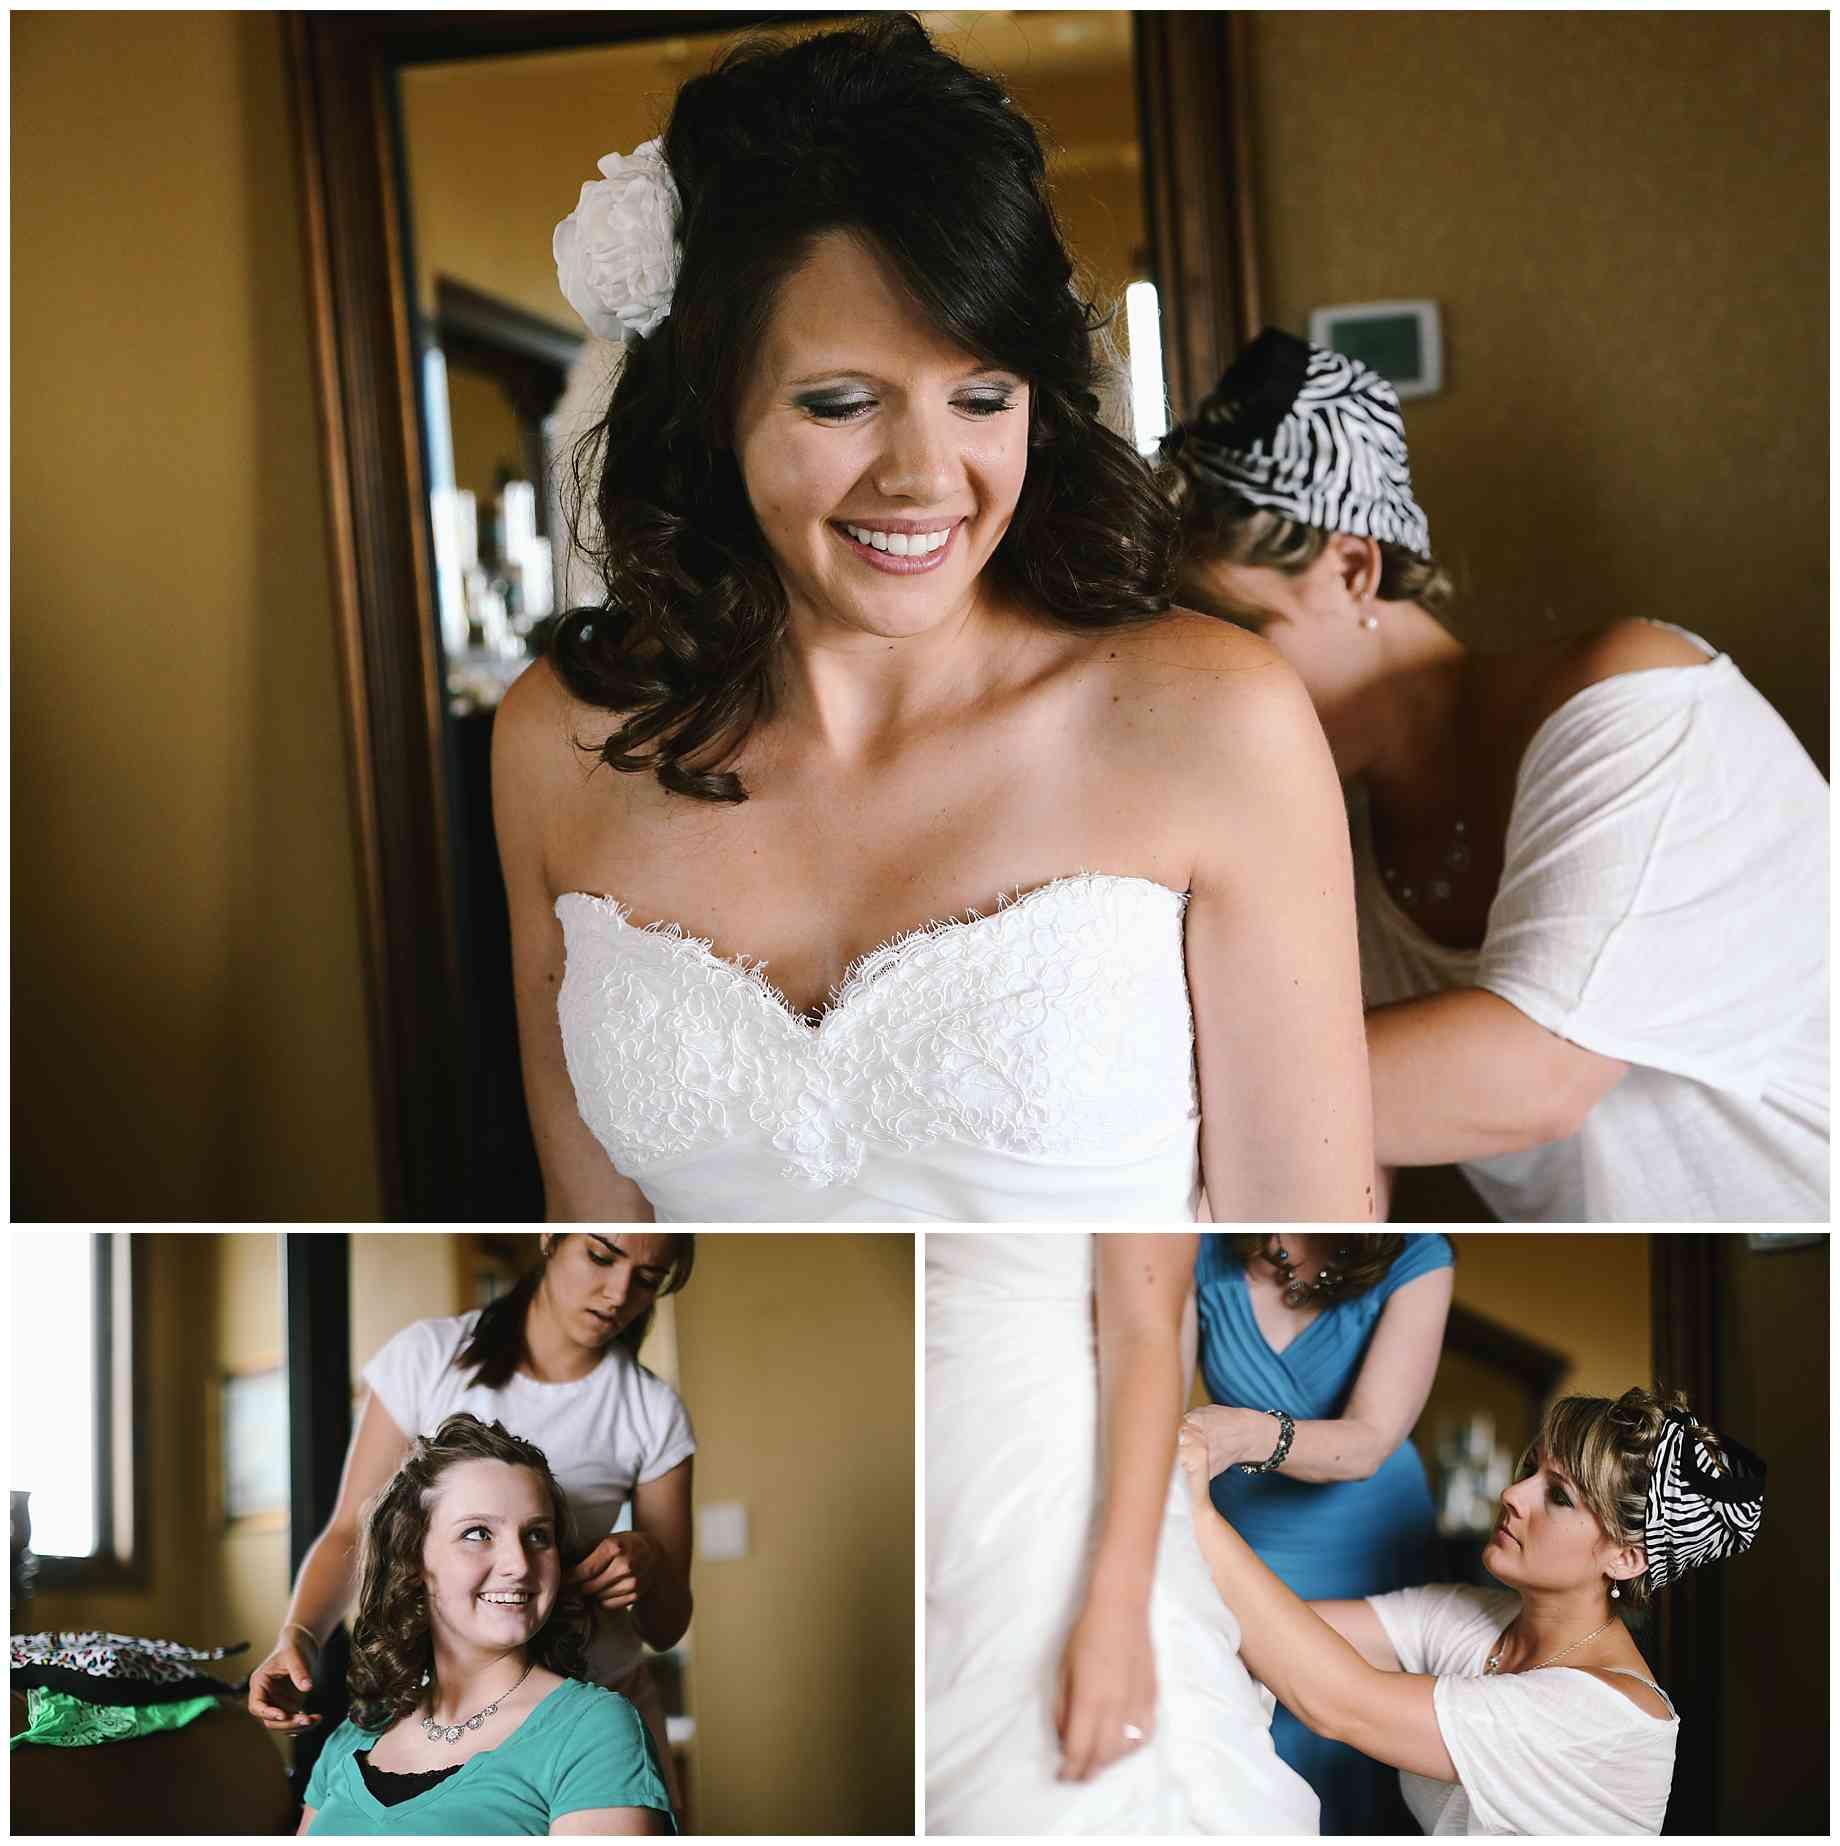 denver-wedding-photography-_0017